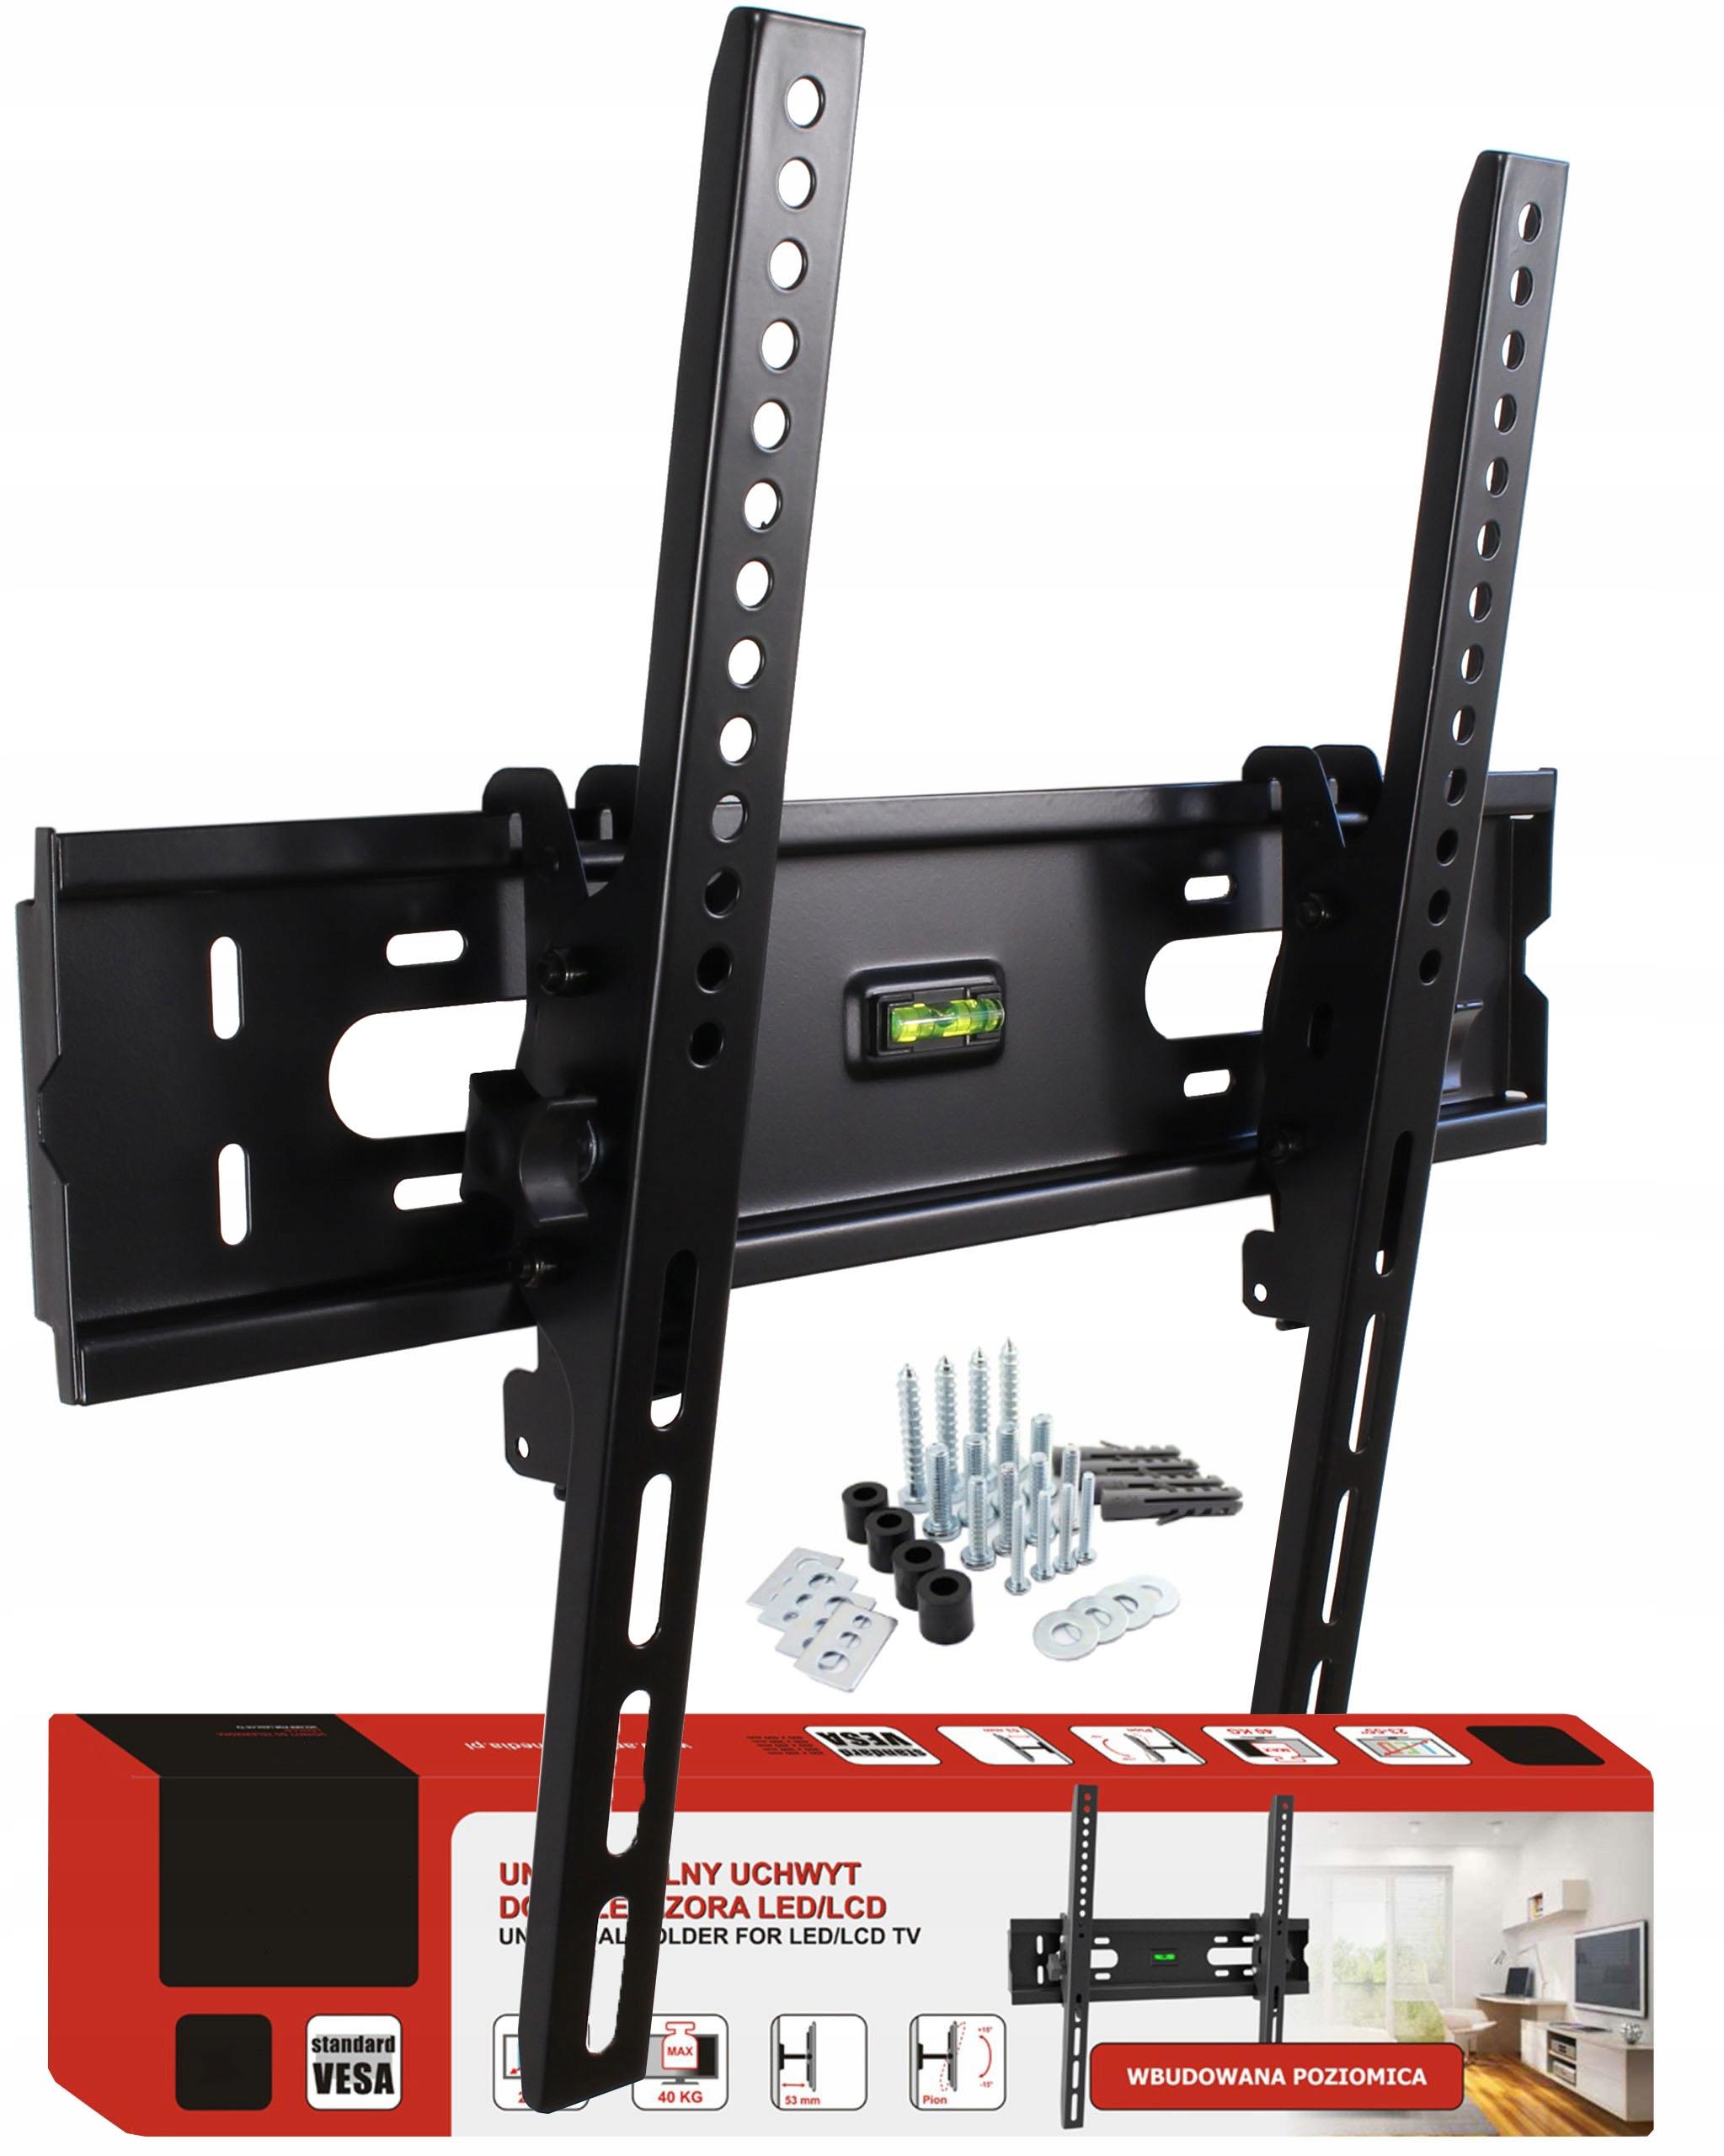 Item BRACKET TV wall BRACKET FOR TVS 23 - 55 40 kg POWERFUL